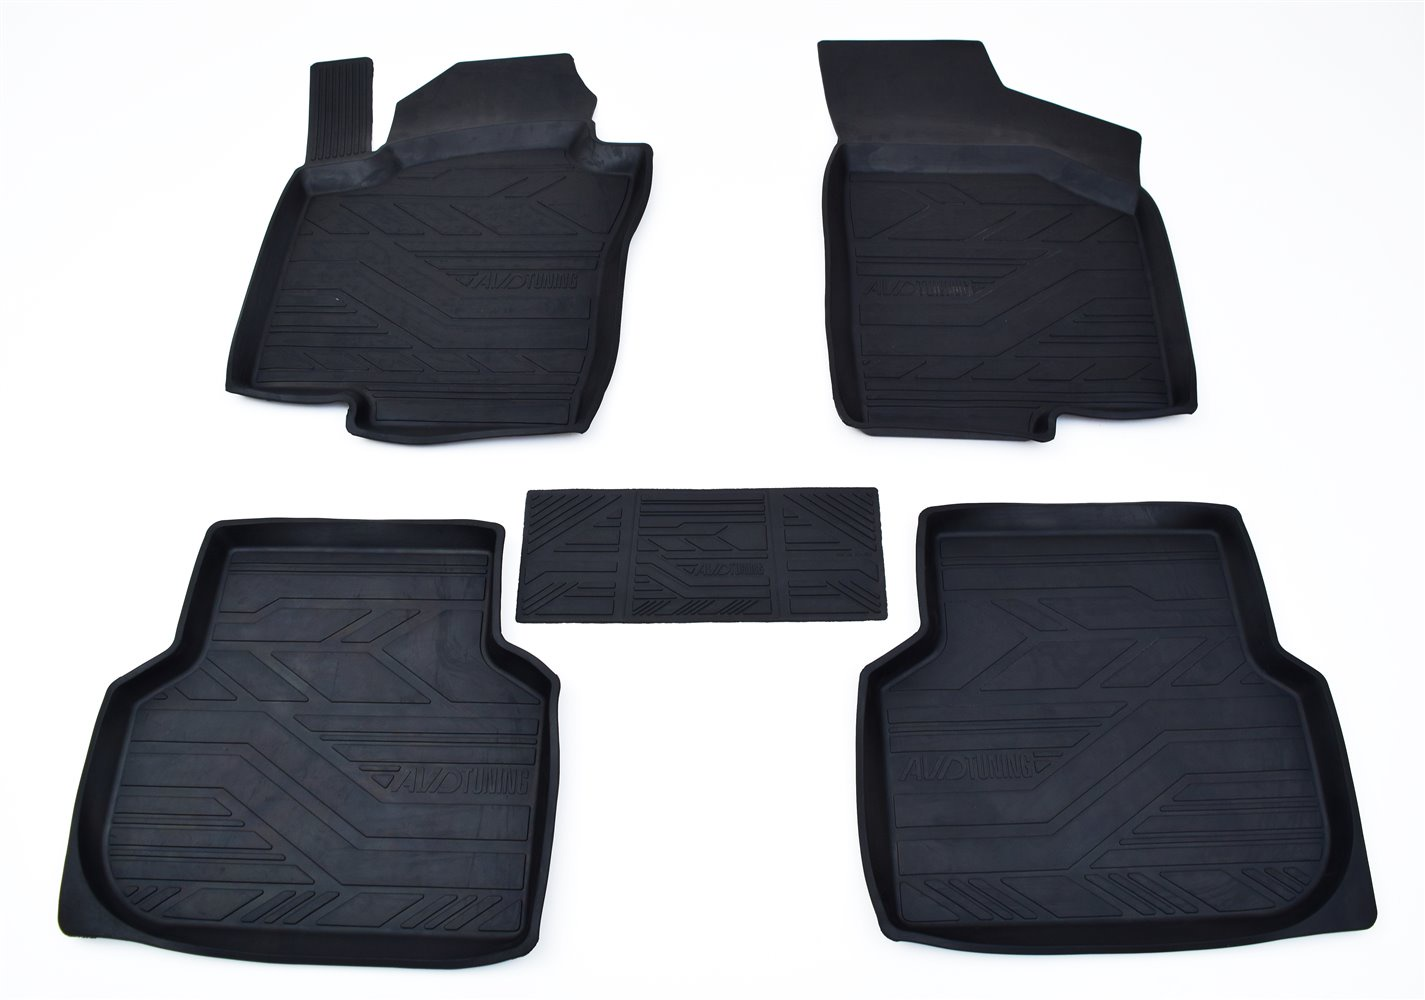 Коврик в багажник Norplast npa00-e31-520 коврик в багажник norplast npa00 t63 910